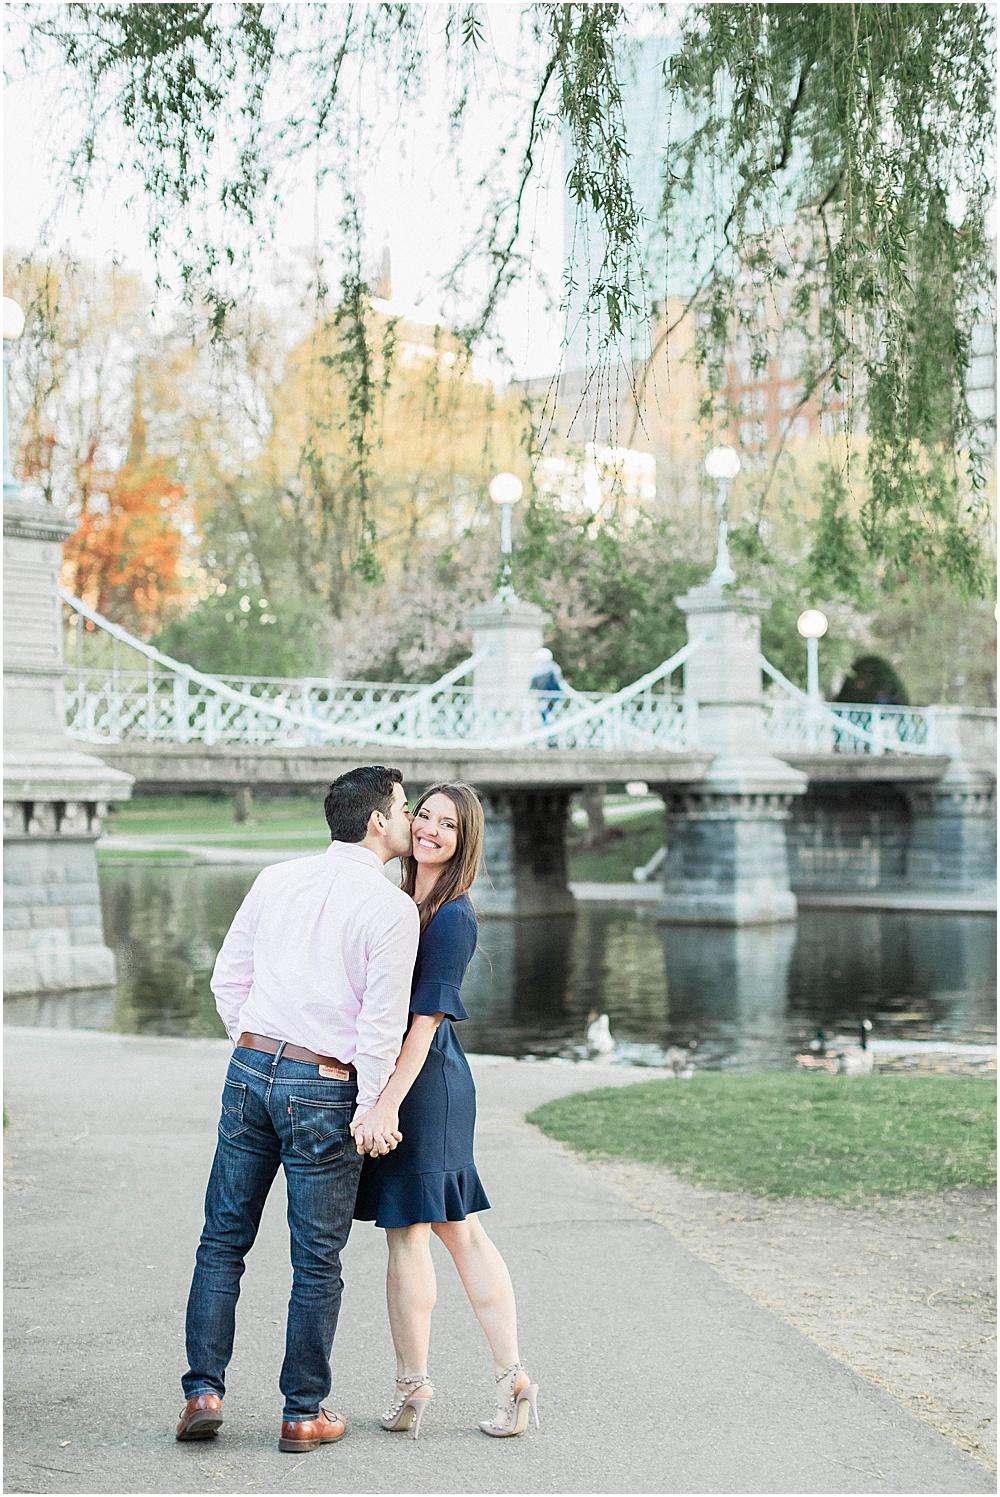 boston_common_cherry_blossoms_spring_engagement_session_boston_wedding_photographer_meredith_jane_photography_photo_0183.jpg